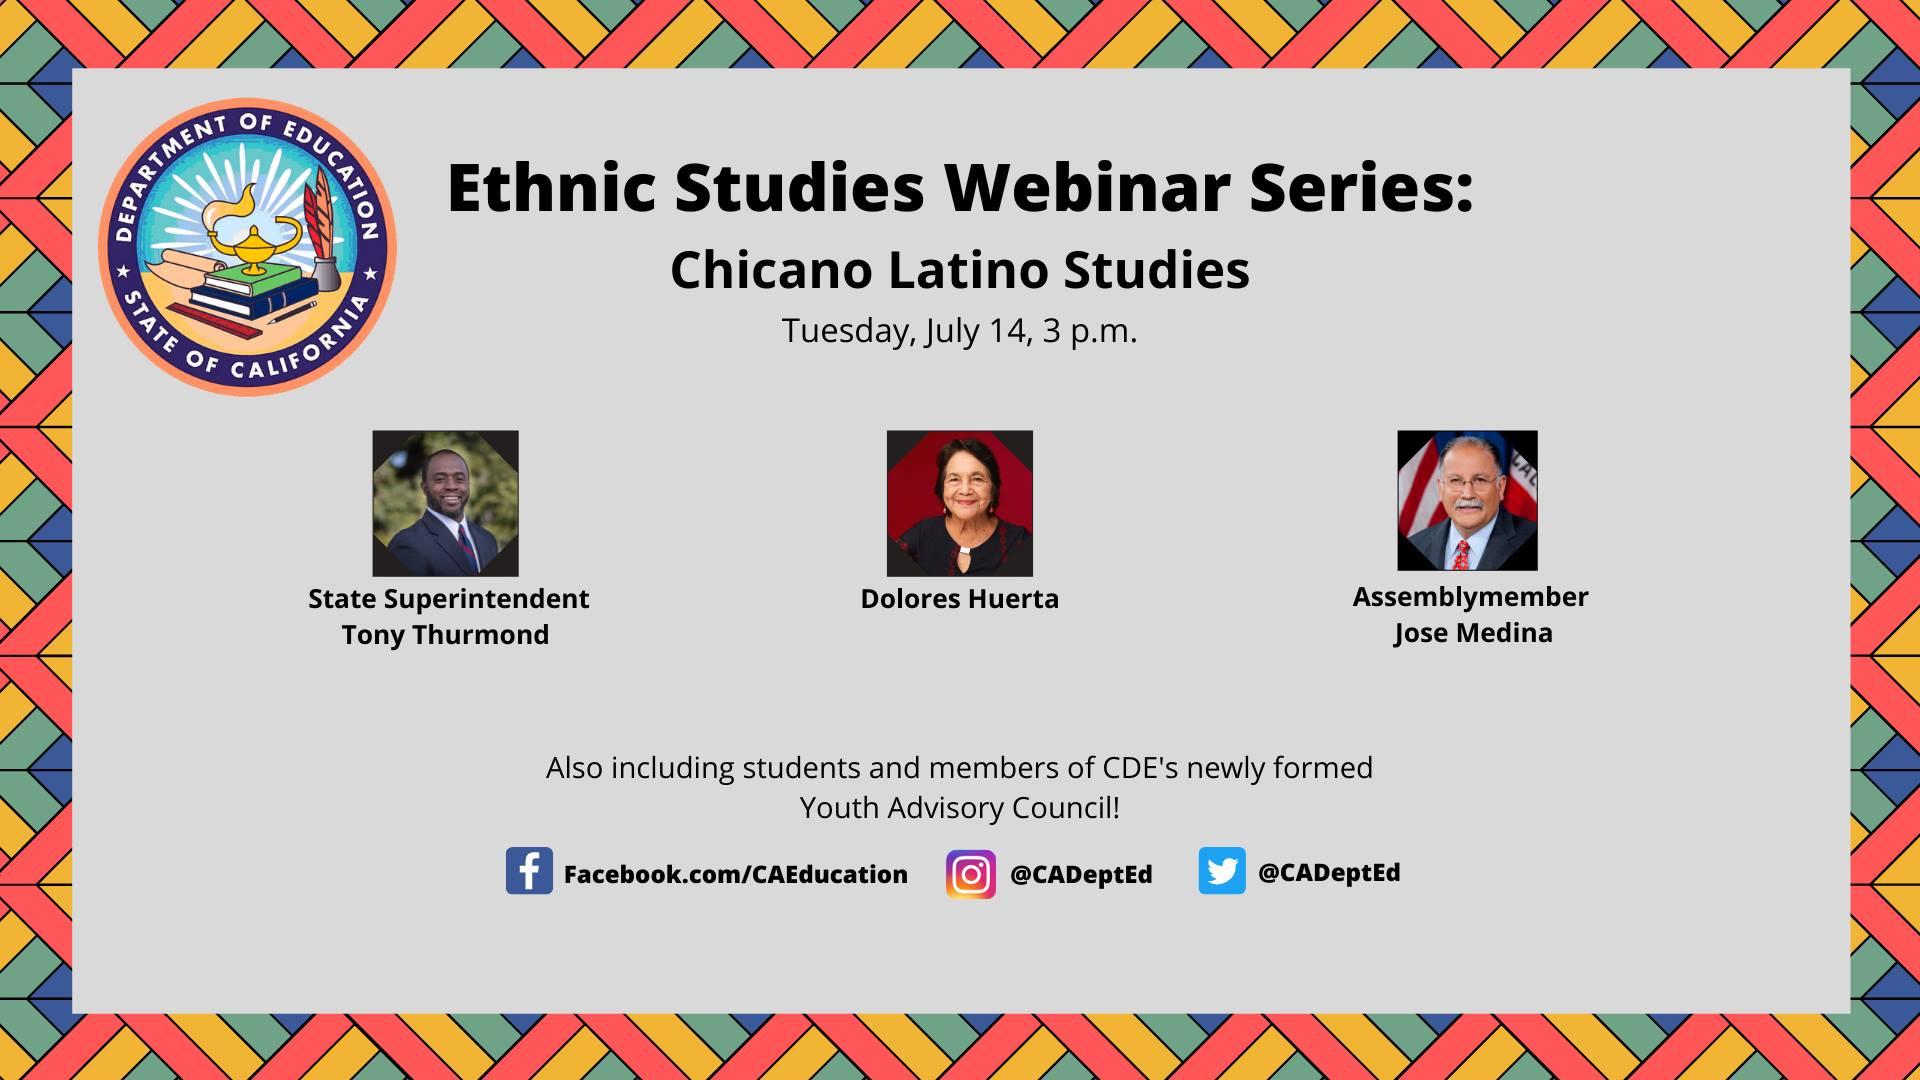 Ethnic Studies Webinar Series: Chicano Latino Studies